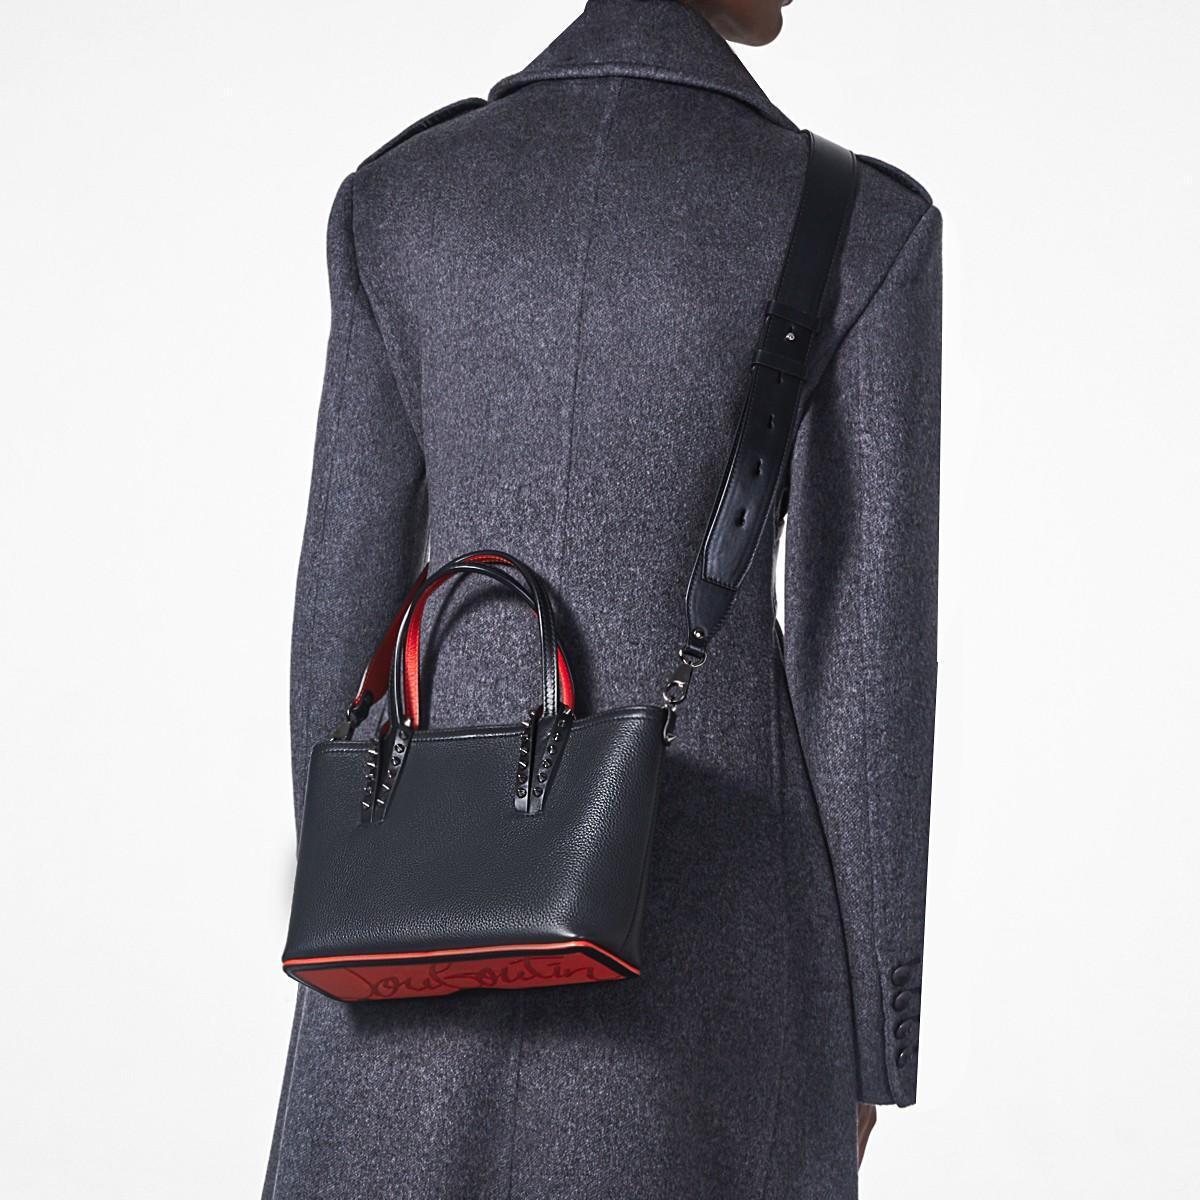 Bags - Cabata Mini Tote Bag - Christian Louboutin